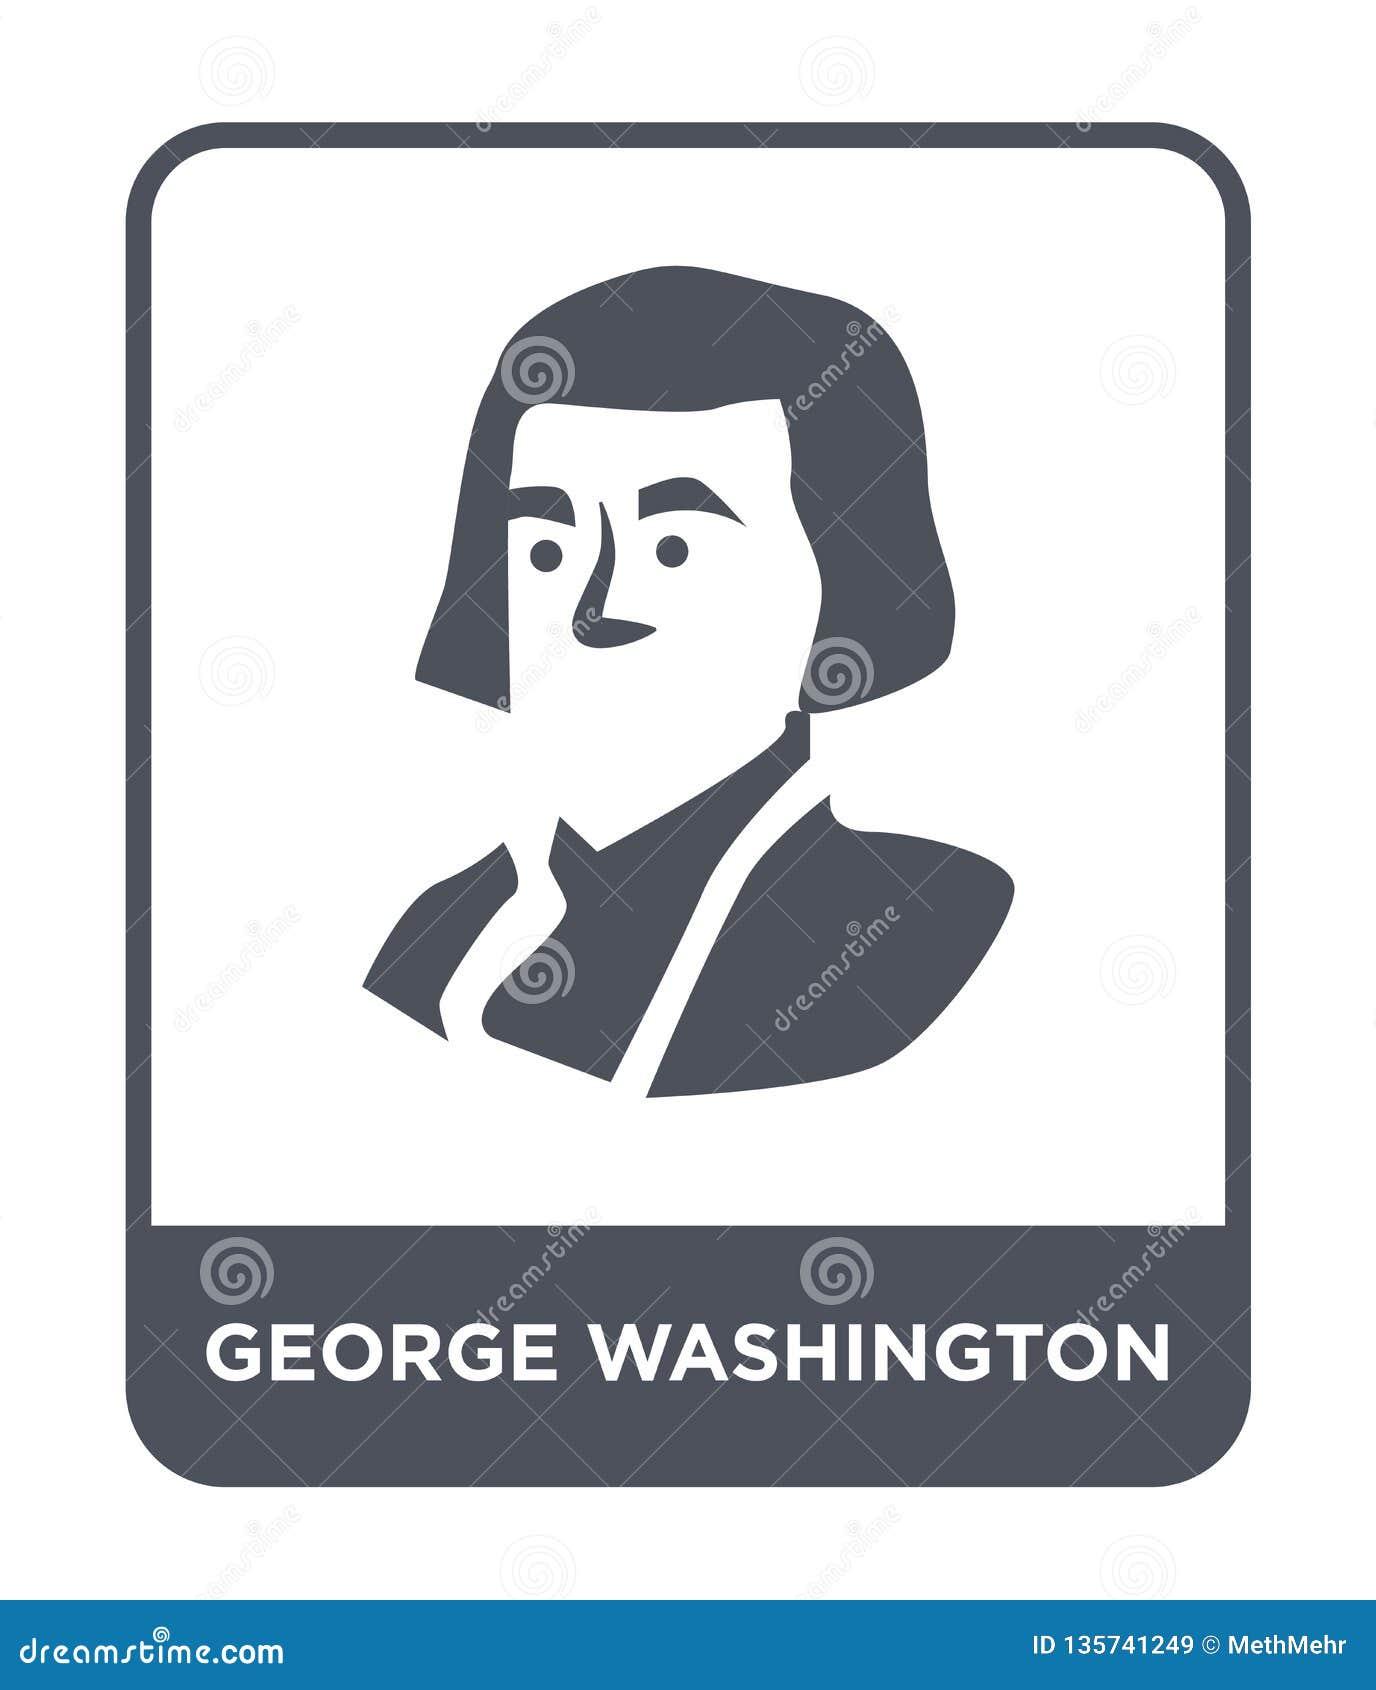 George Washington ikona w modnym projekta stylu george Washington ikona odizolowywająca na białym tle george Washington wektoru i